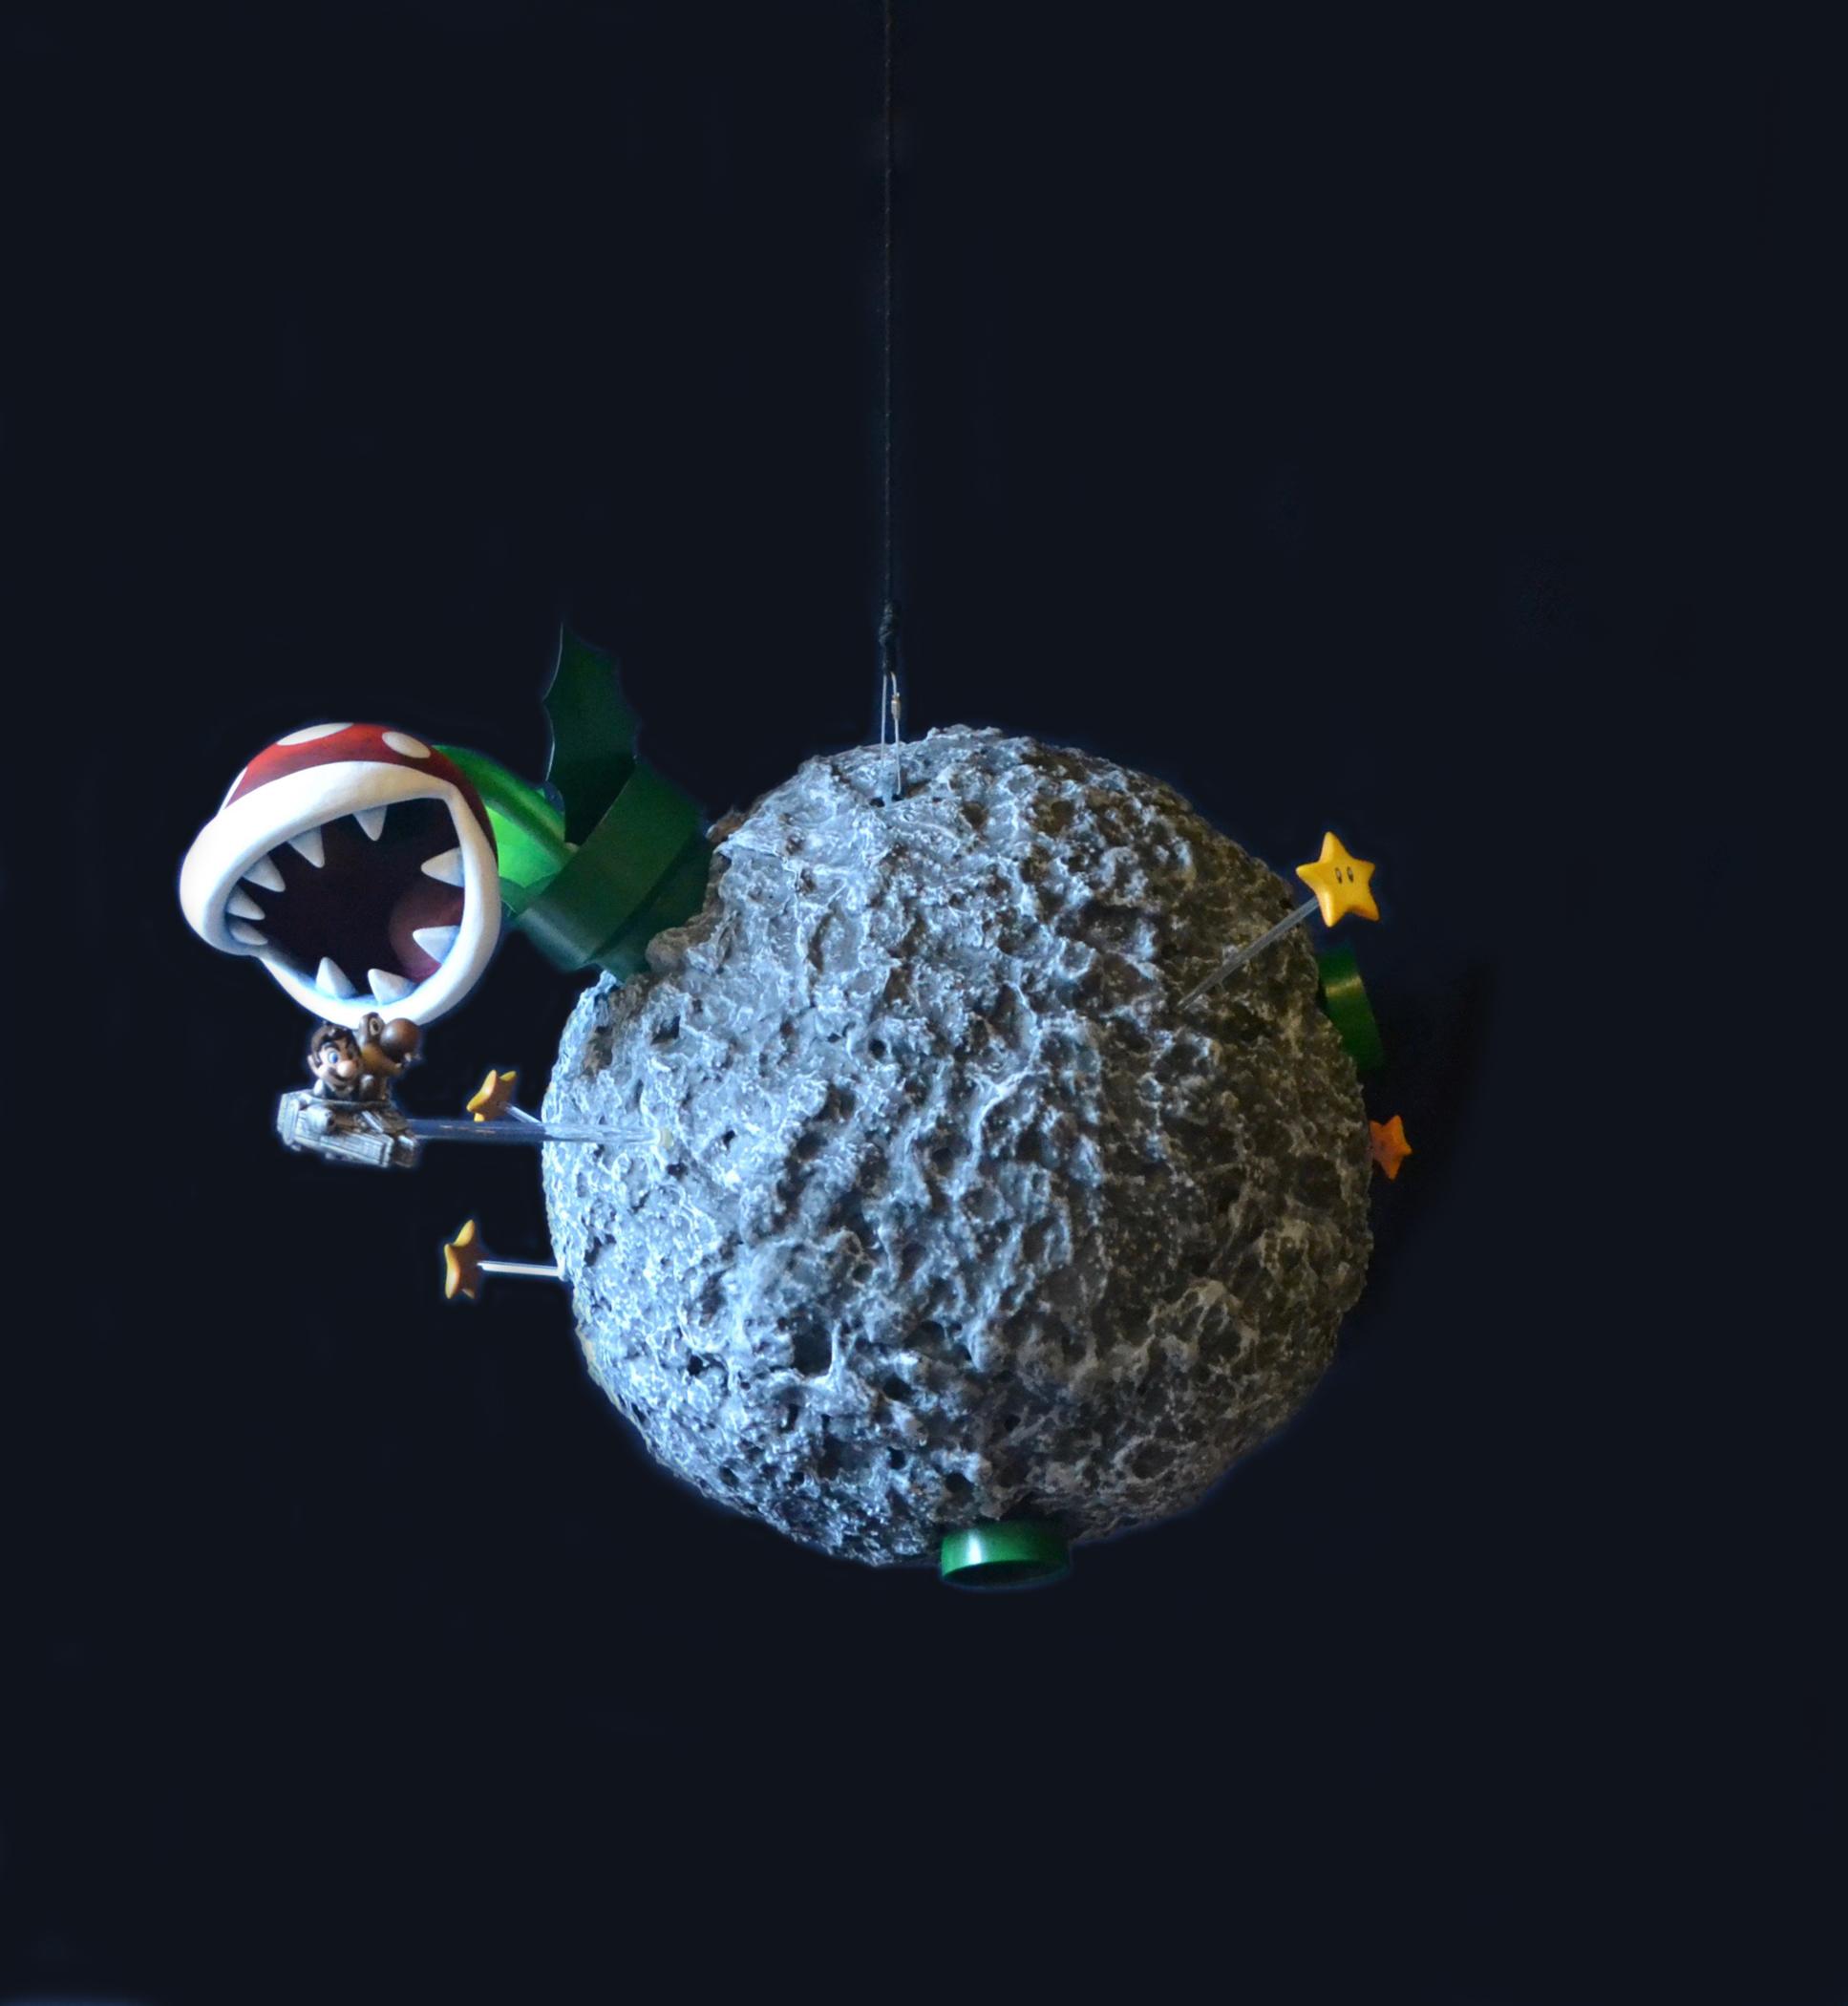 Piranha Astro-Asteroid